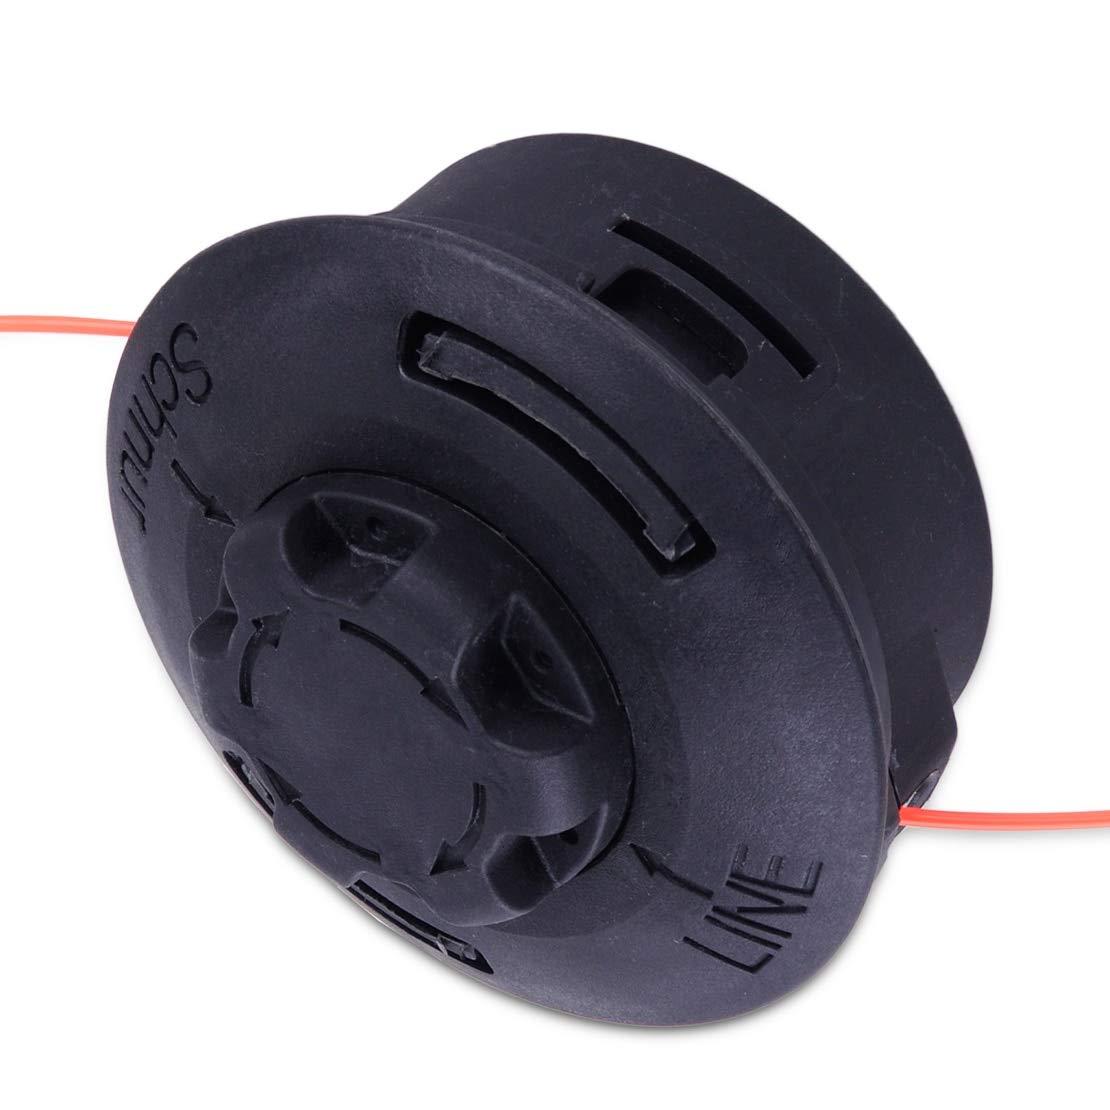 Laliva tools Autocut C 25-2 Trimmer Line Head Fit For Stihl FS 44 FS 44R FS 55 FS 55C 4002 710 2196